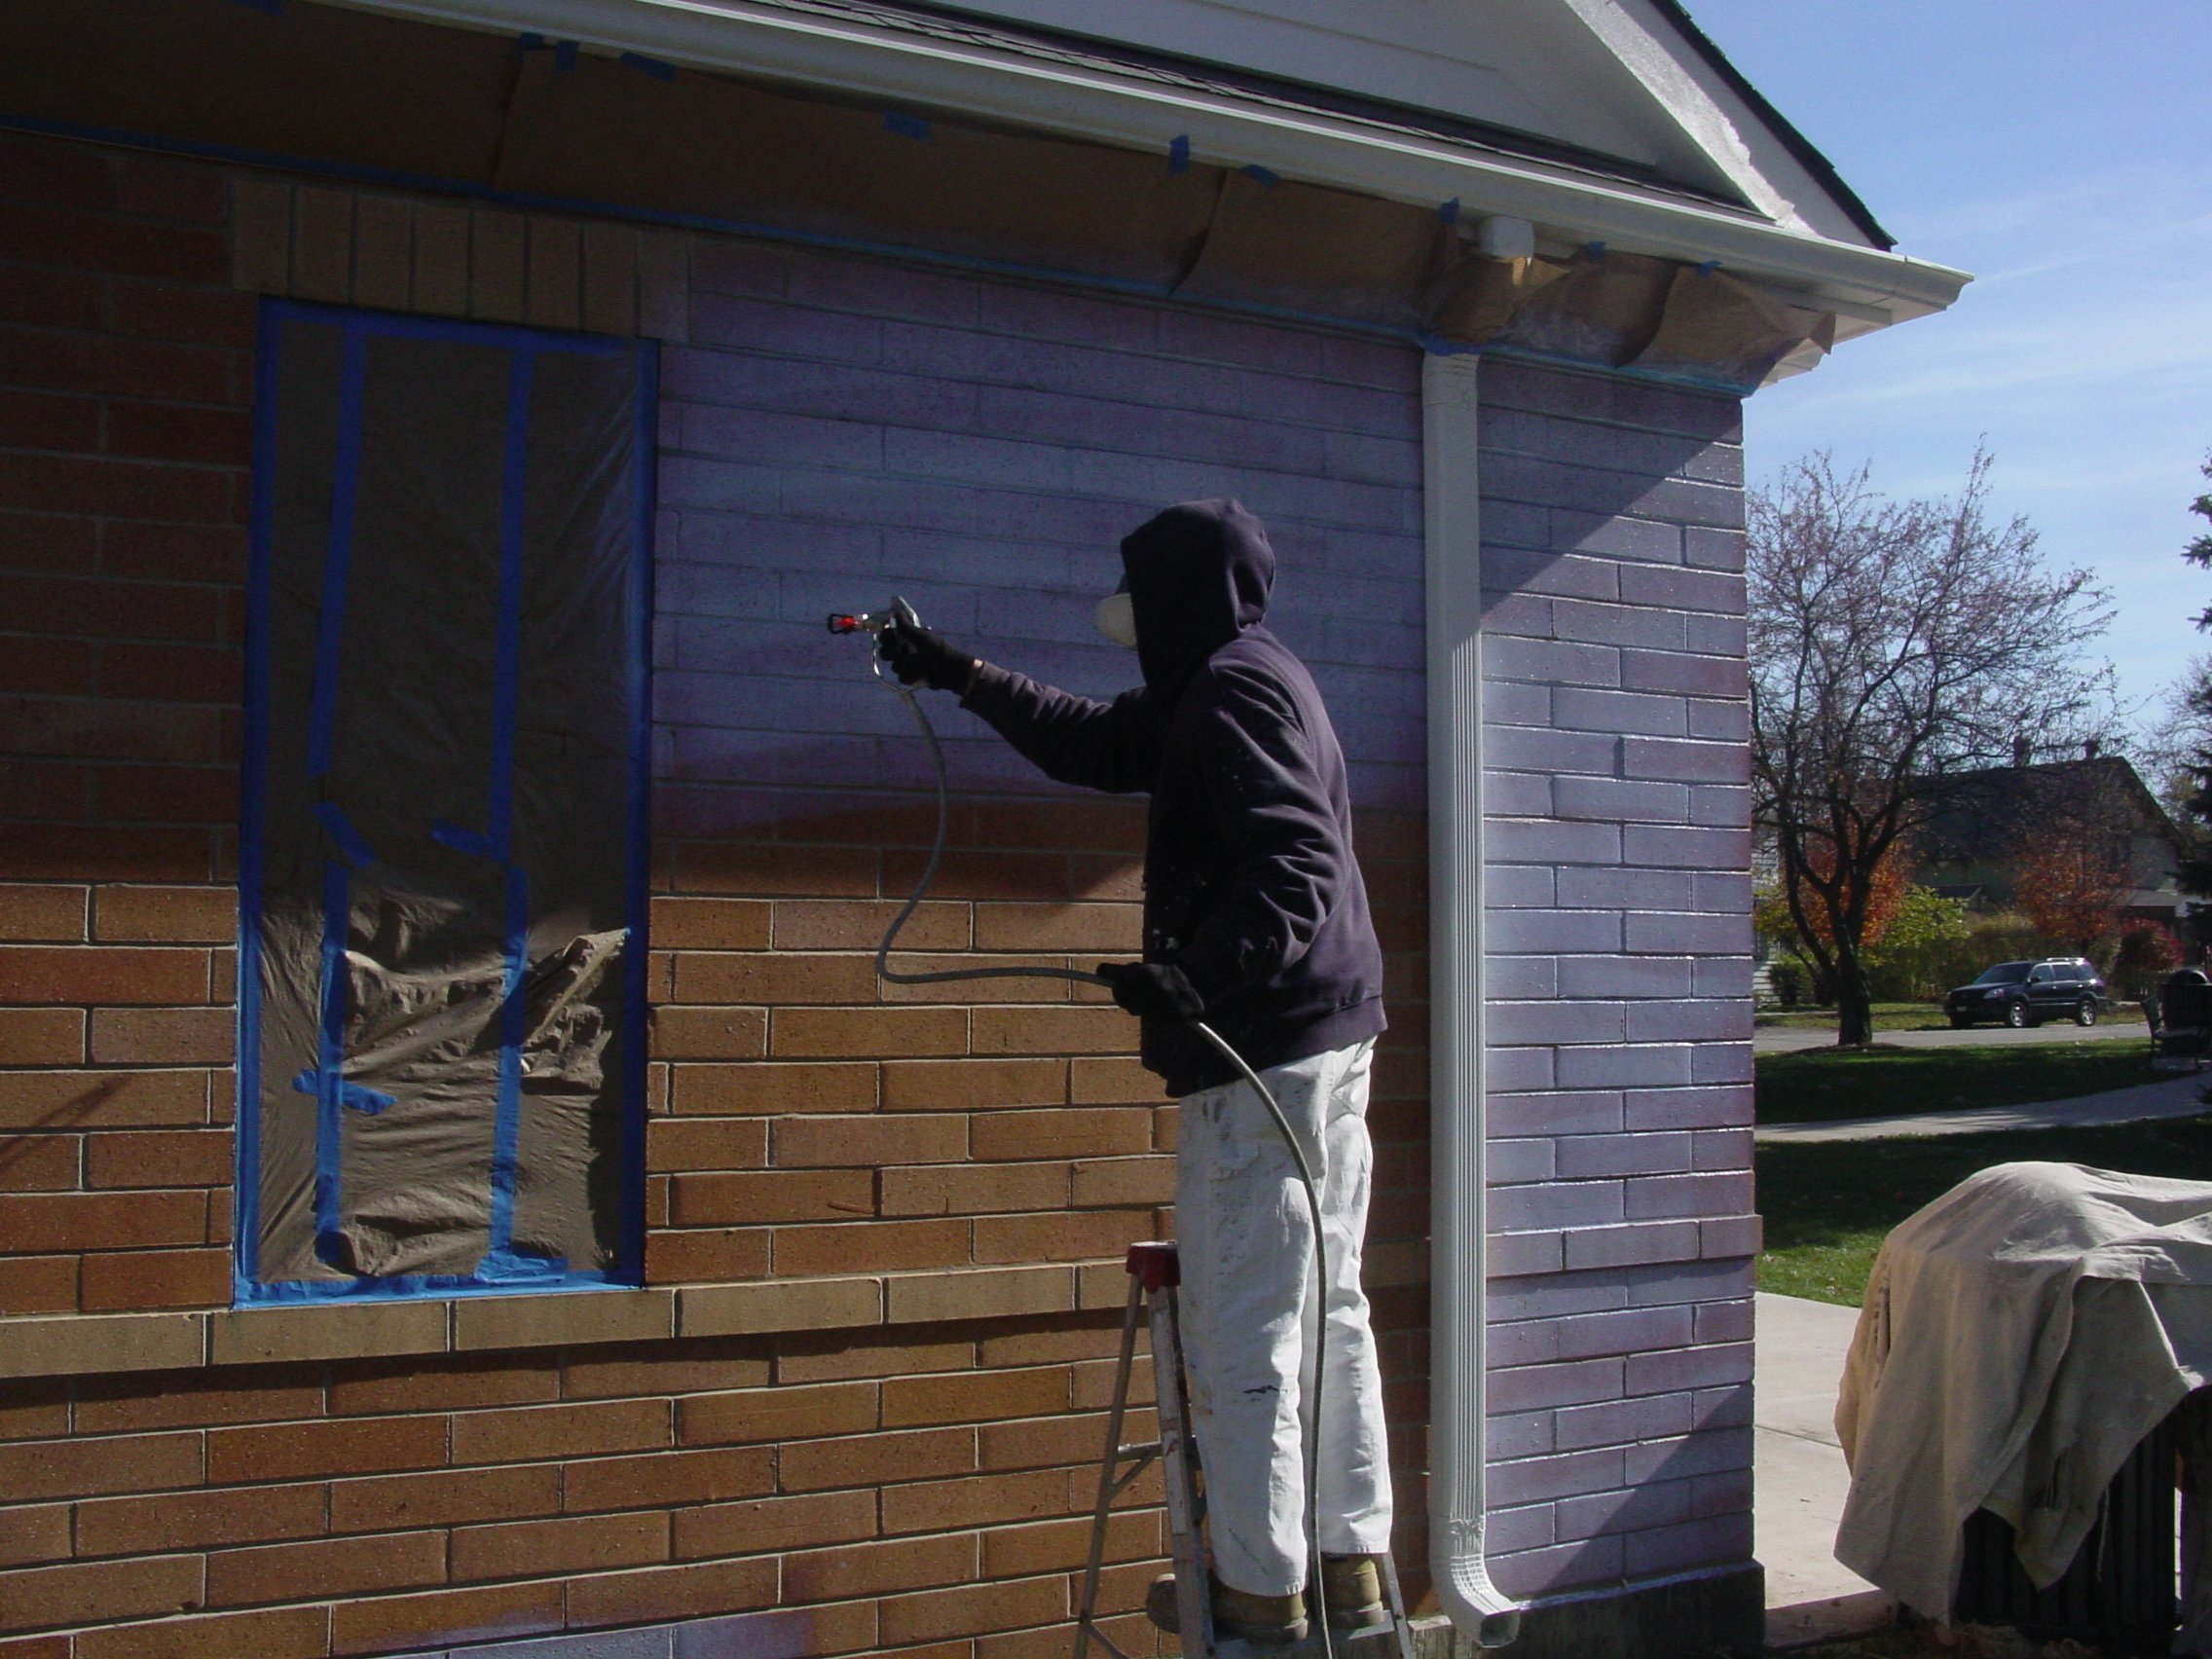 Rainguard International VG-7001 1 gal Ready to Use Vandlguard Non-Sacrificial Anti-Graffiti Coating - Painted & Unpainted Concrete, Block, CMU, Brick, EIFS, Stucco, Wood & Painted Metal, Clear